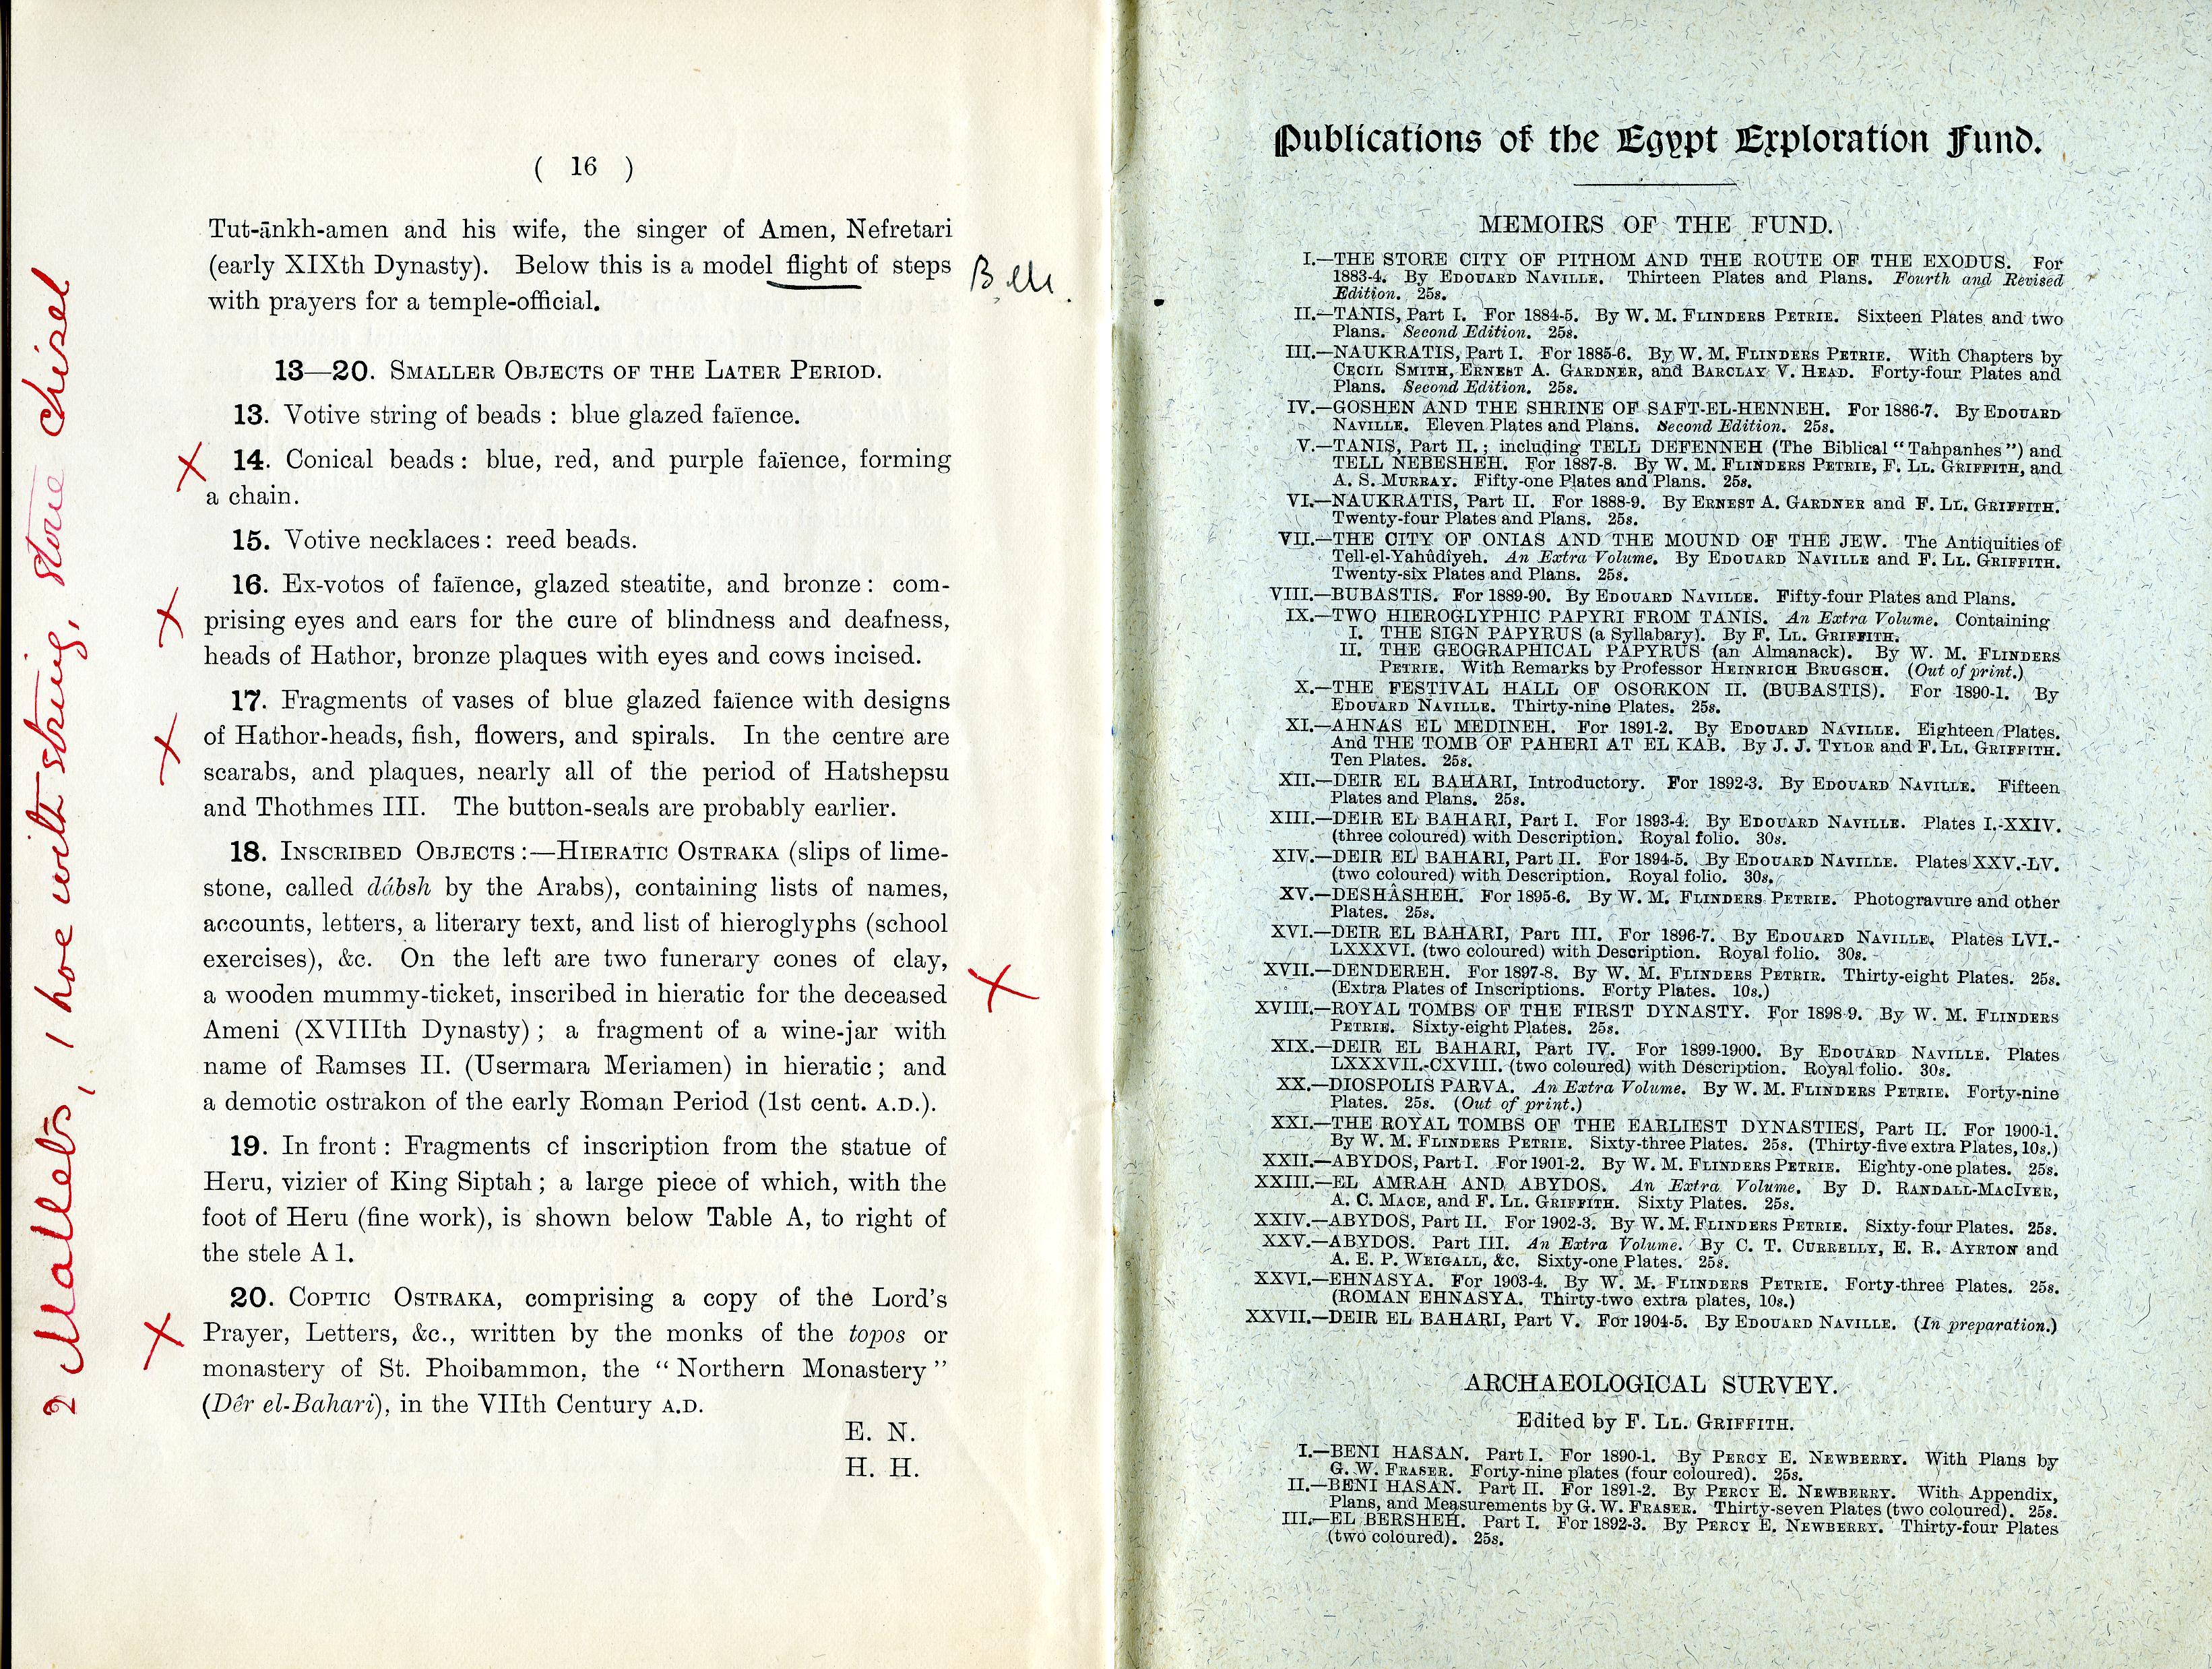 1904-05 Deir el-Bahri, Sinai, Oxyrhynchus DIST.24.04j